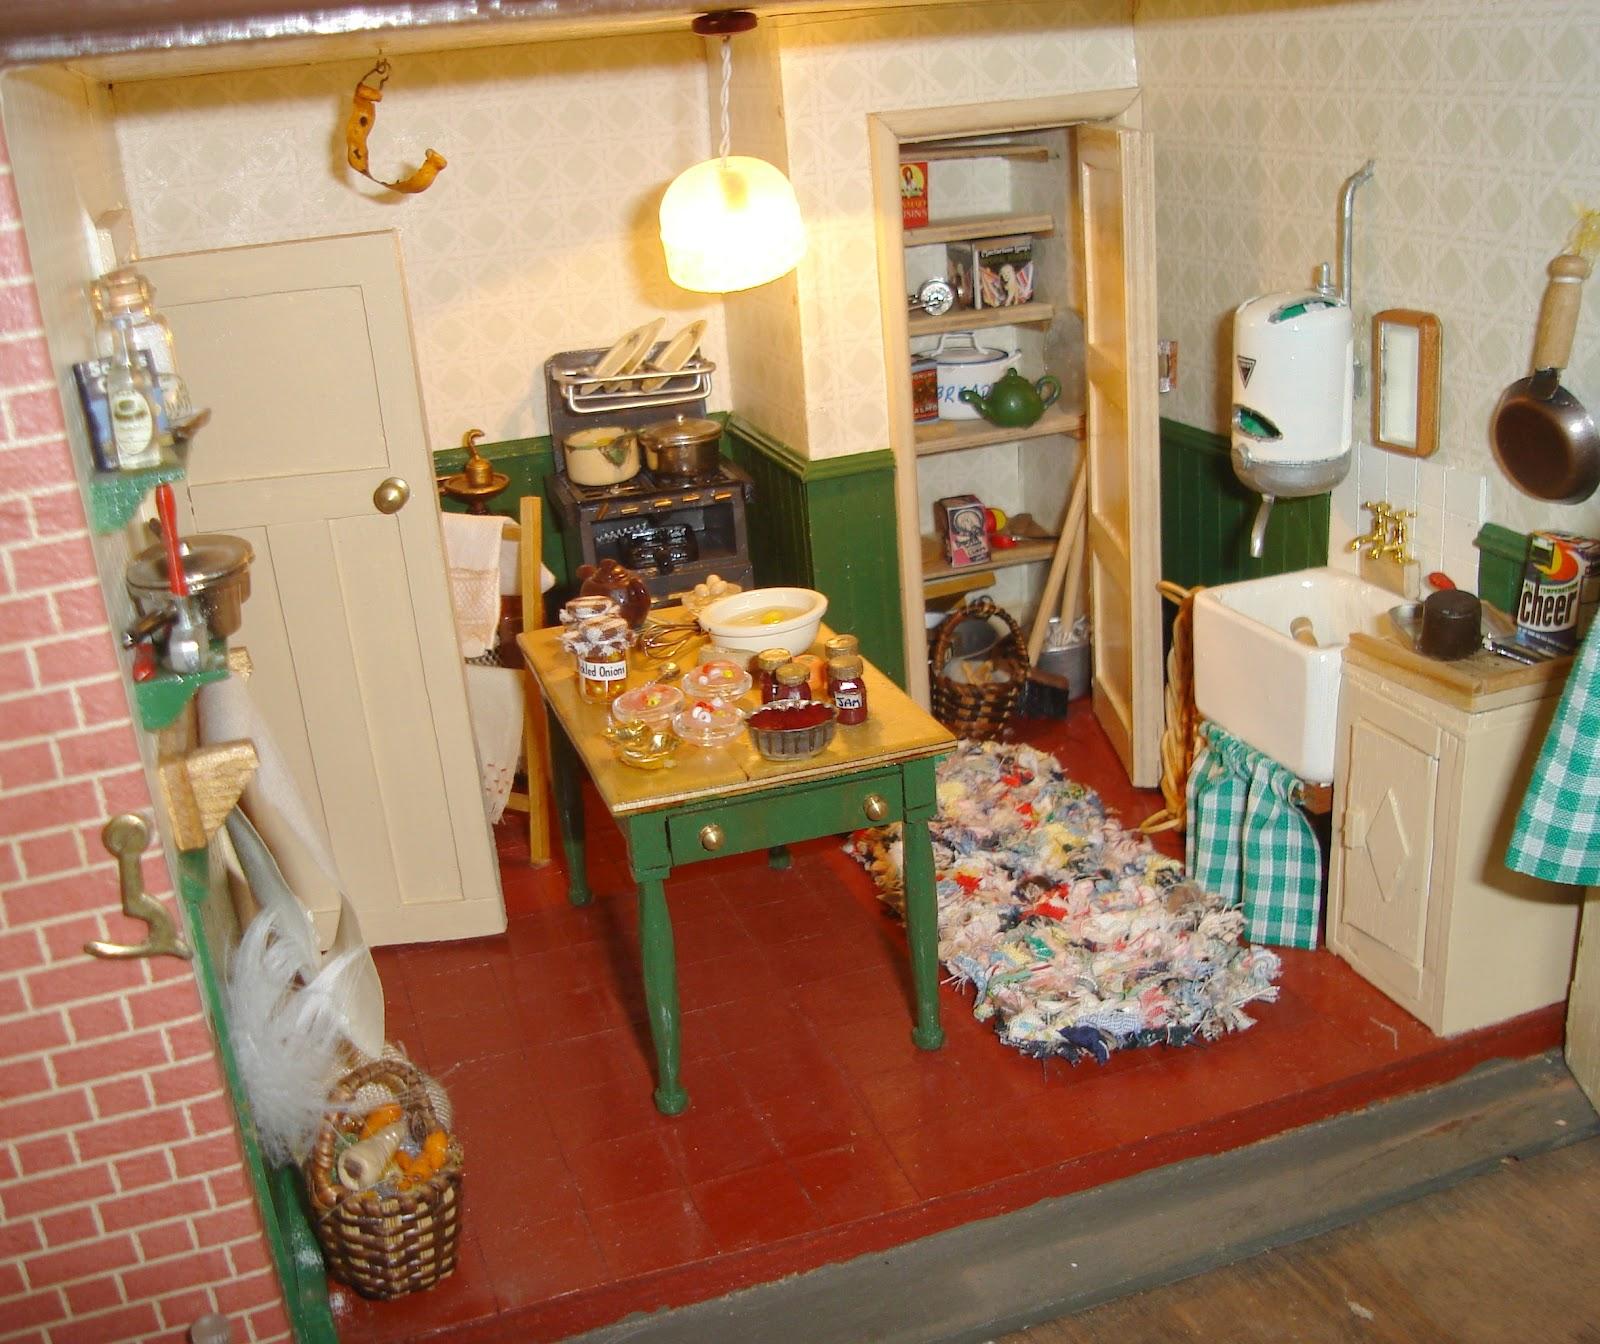 Dolls House Kitchen Furniture World Costume Dolls New Dolls From Switzerland Gambia And Yemen